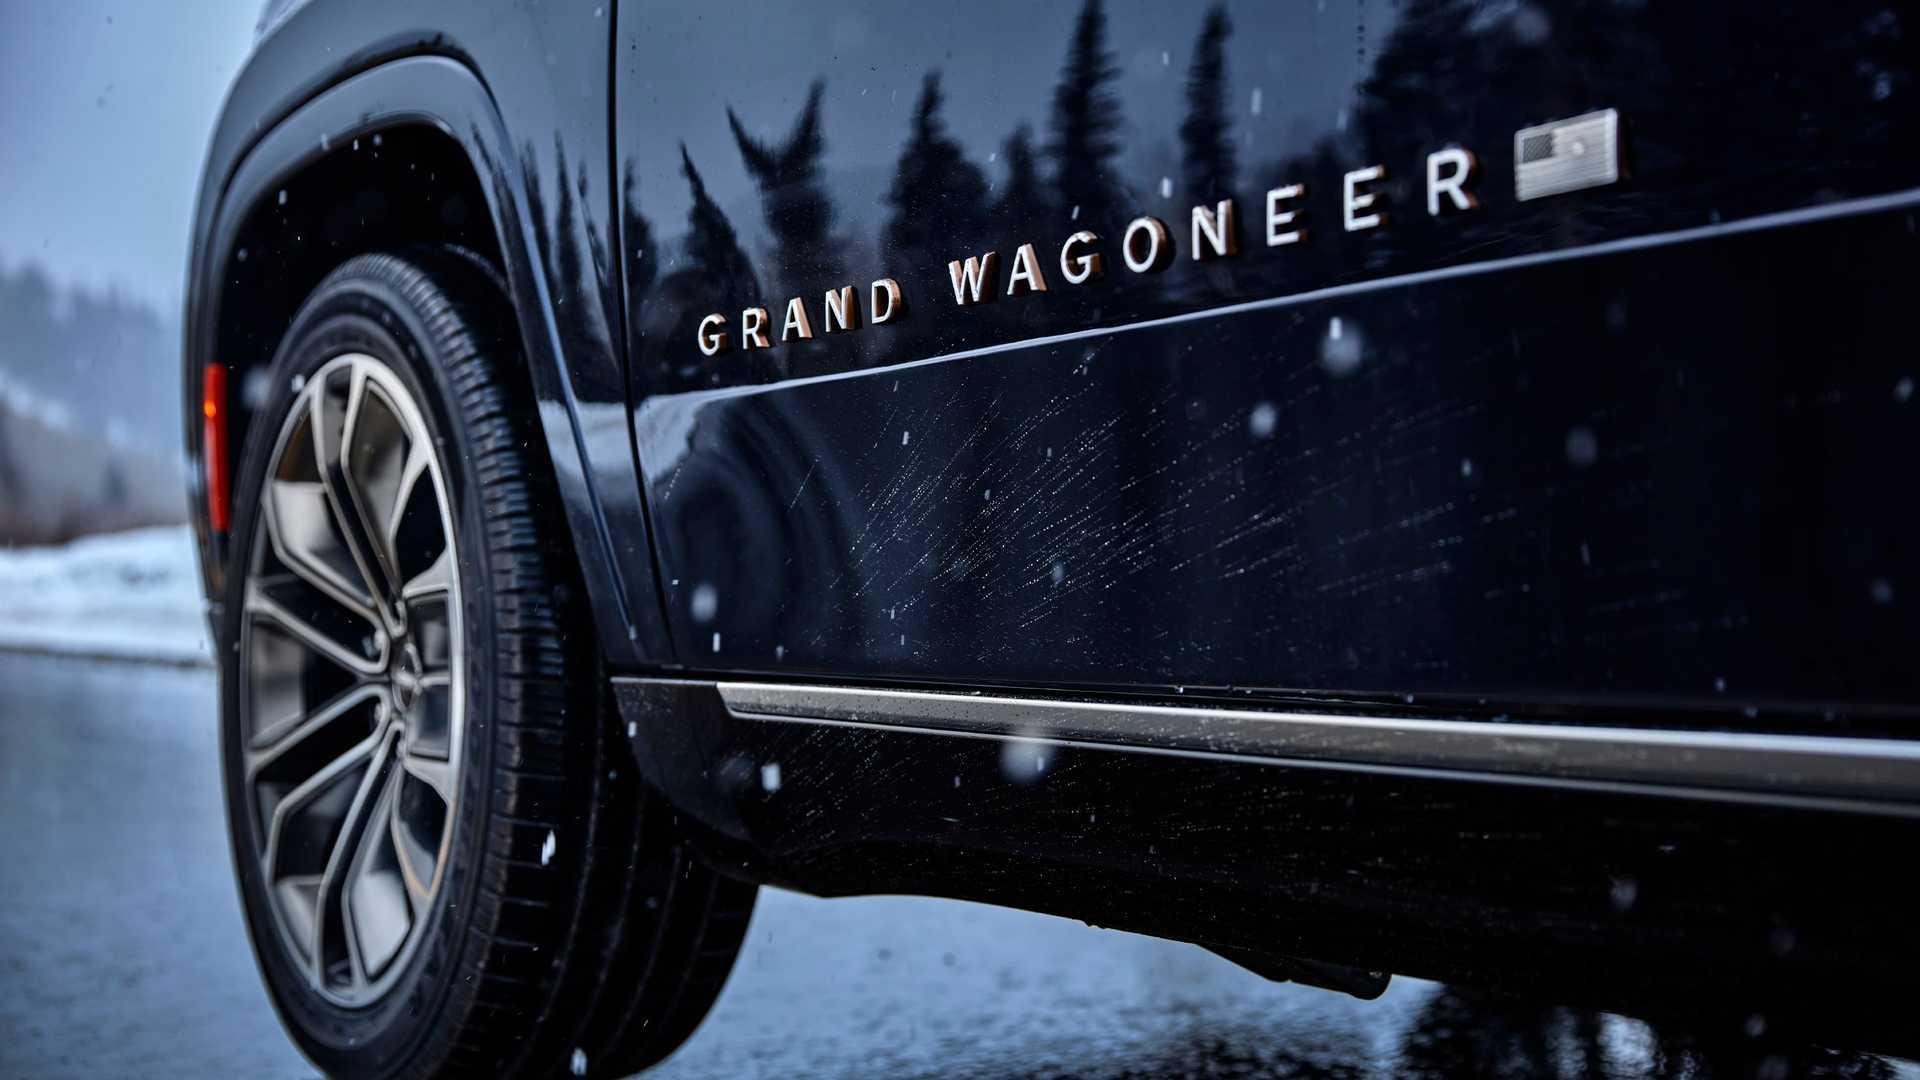 2022-jeep-grand-wagoneer-exterior-badging-1